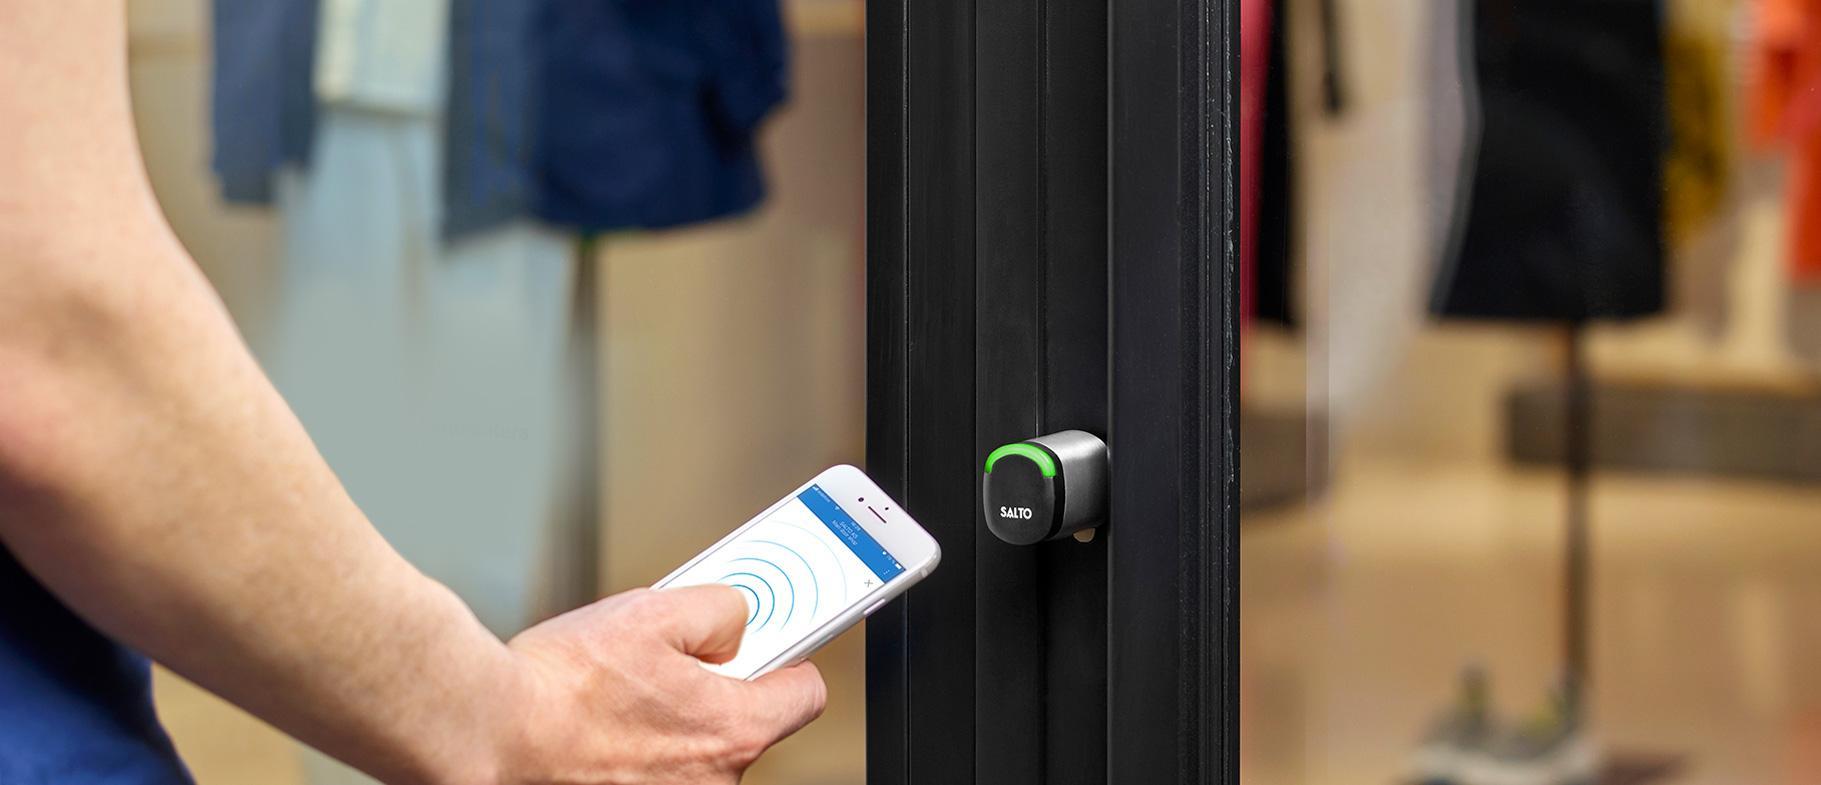 Retail access control